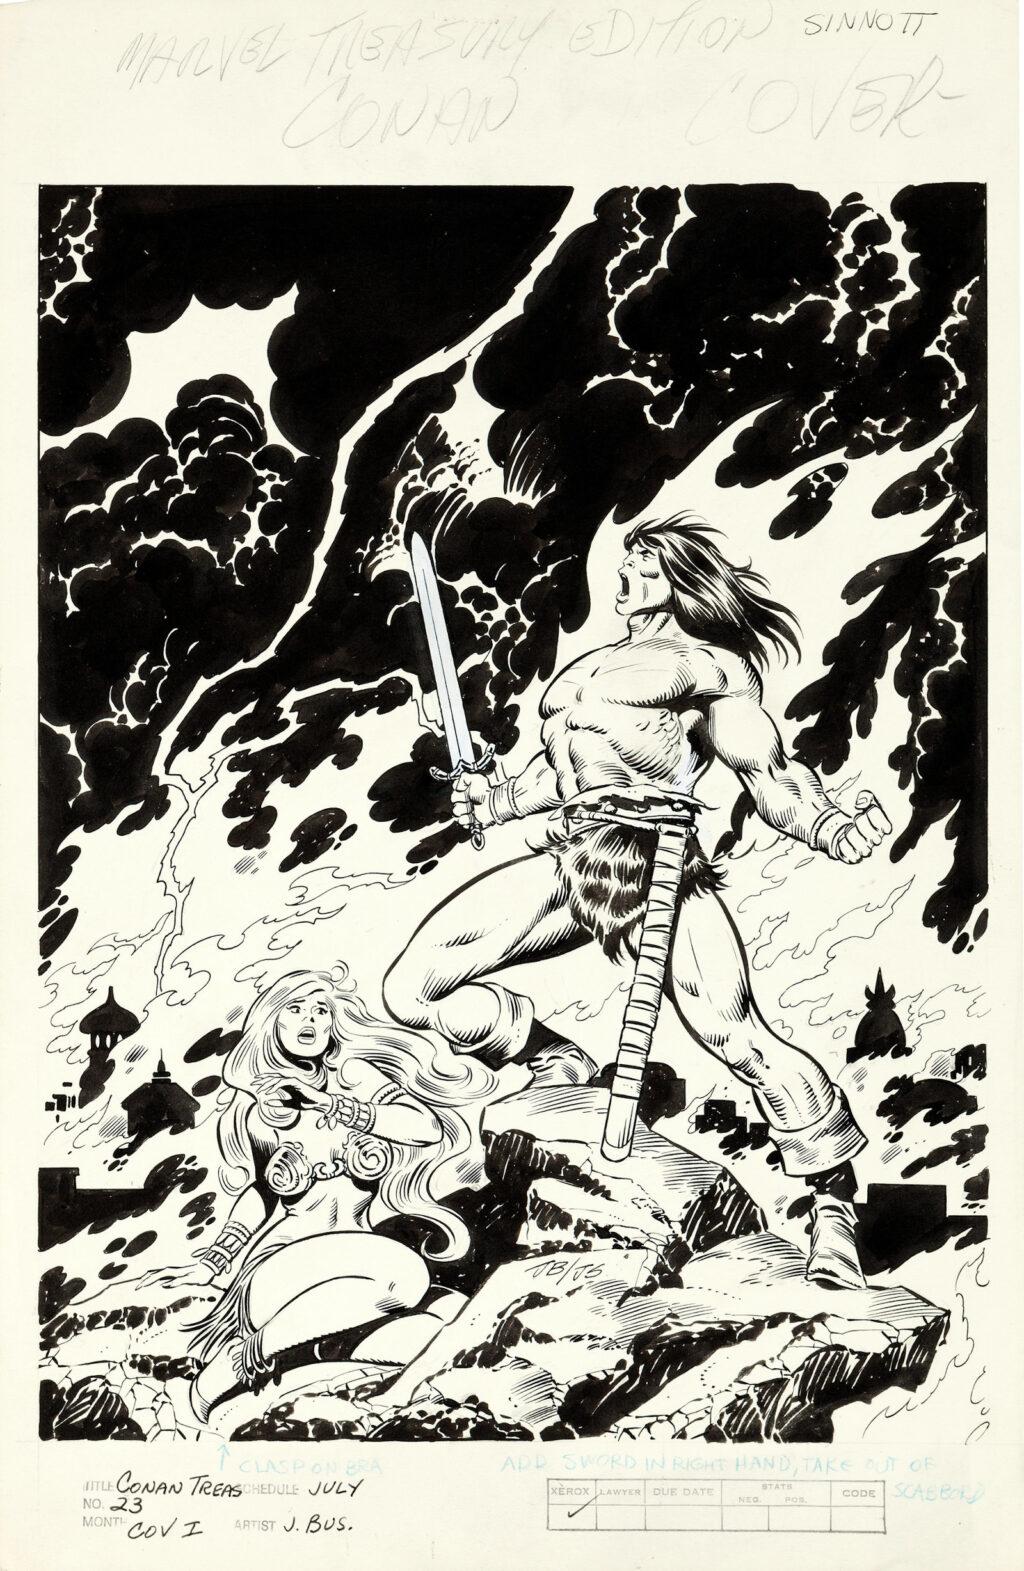 Marvel Treasury Edition issue 23 cover by John Buscema and Joe Sinnott